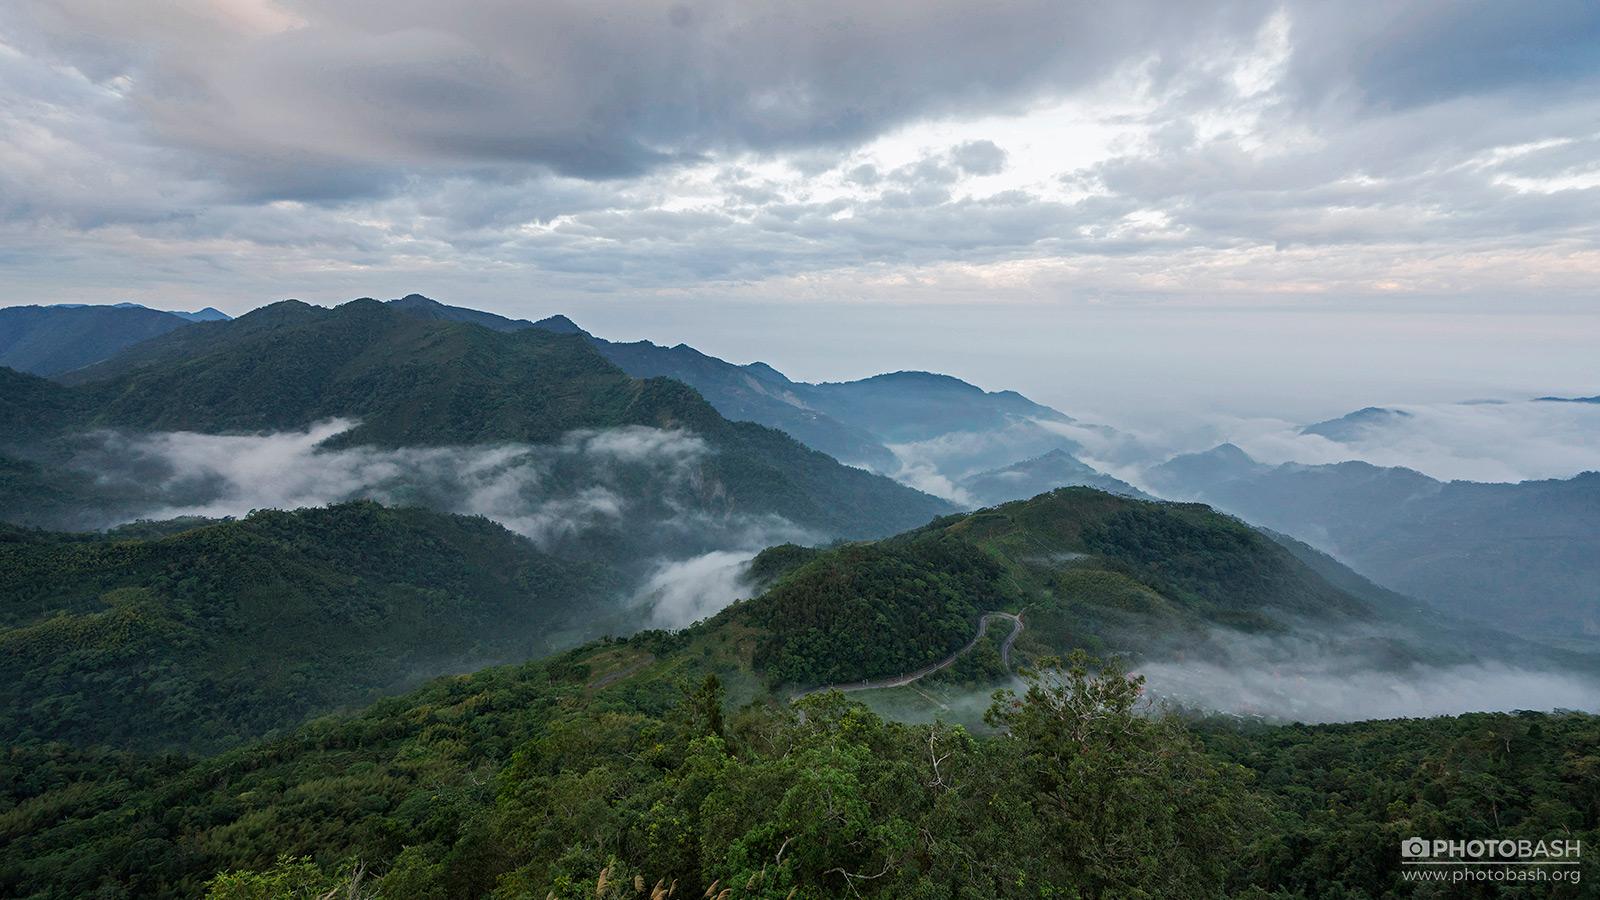 Alishan-Mountains-Misty-Valley-Landscape.jpg